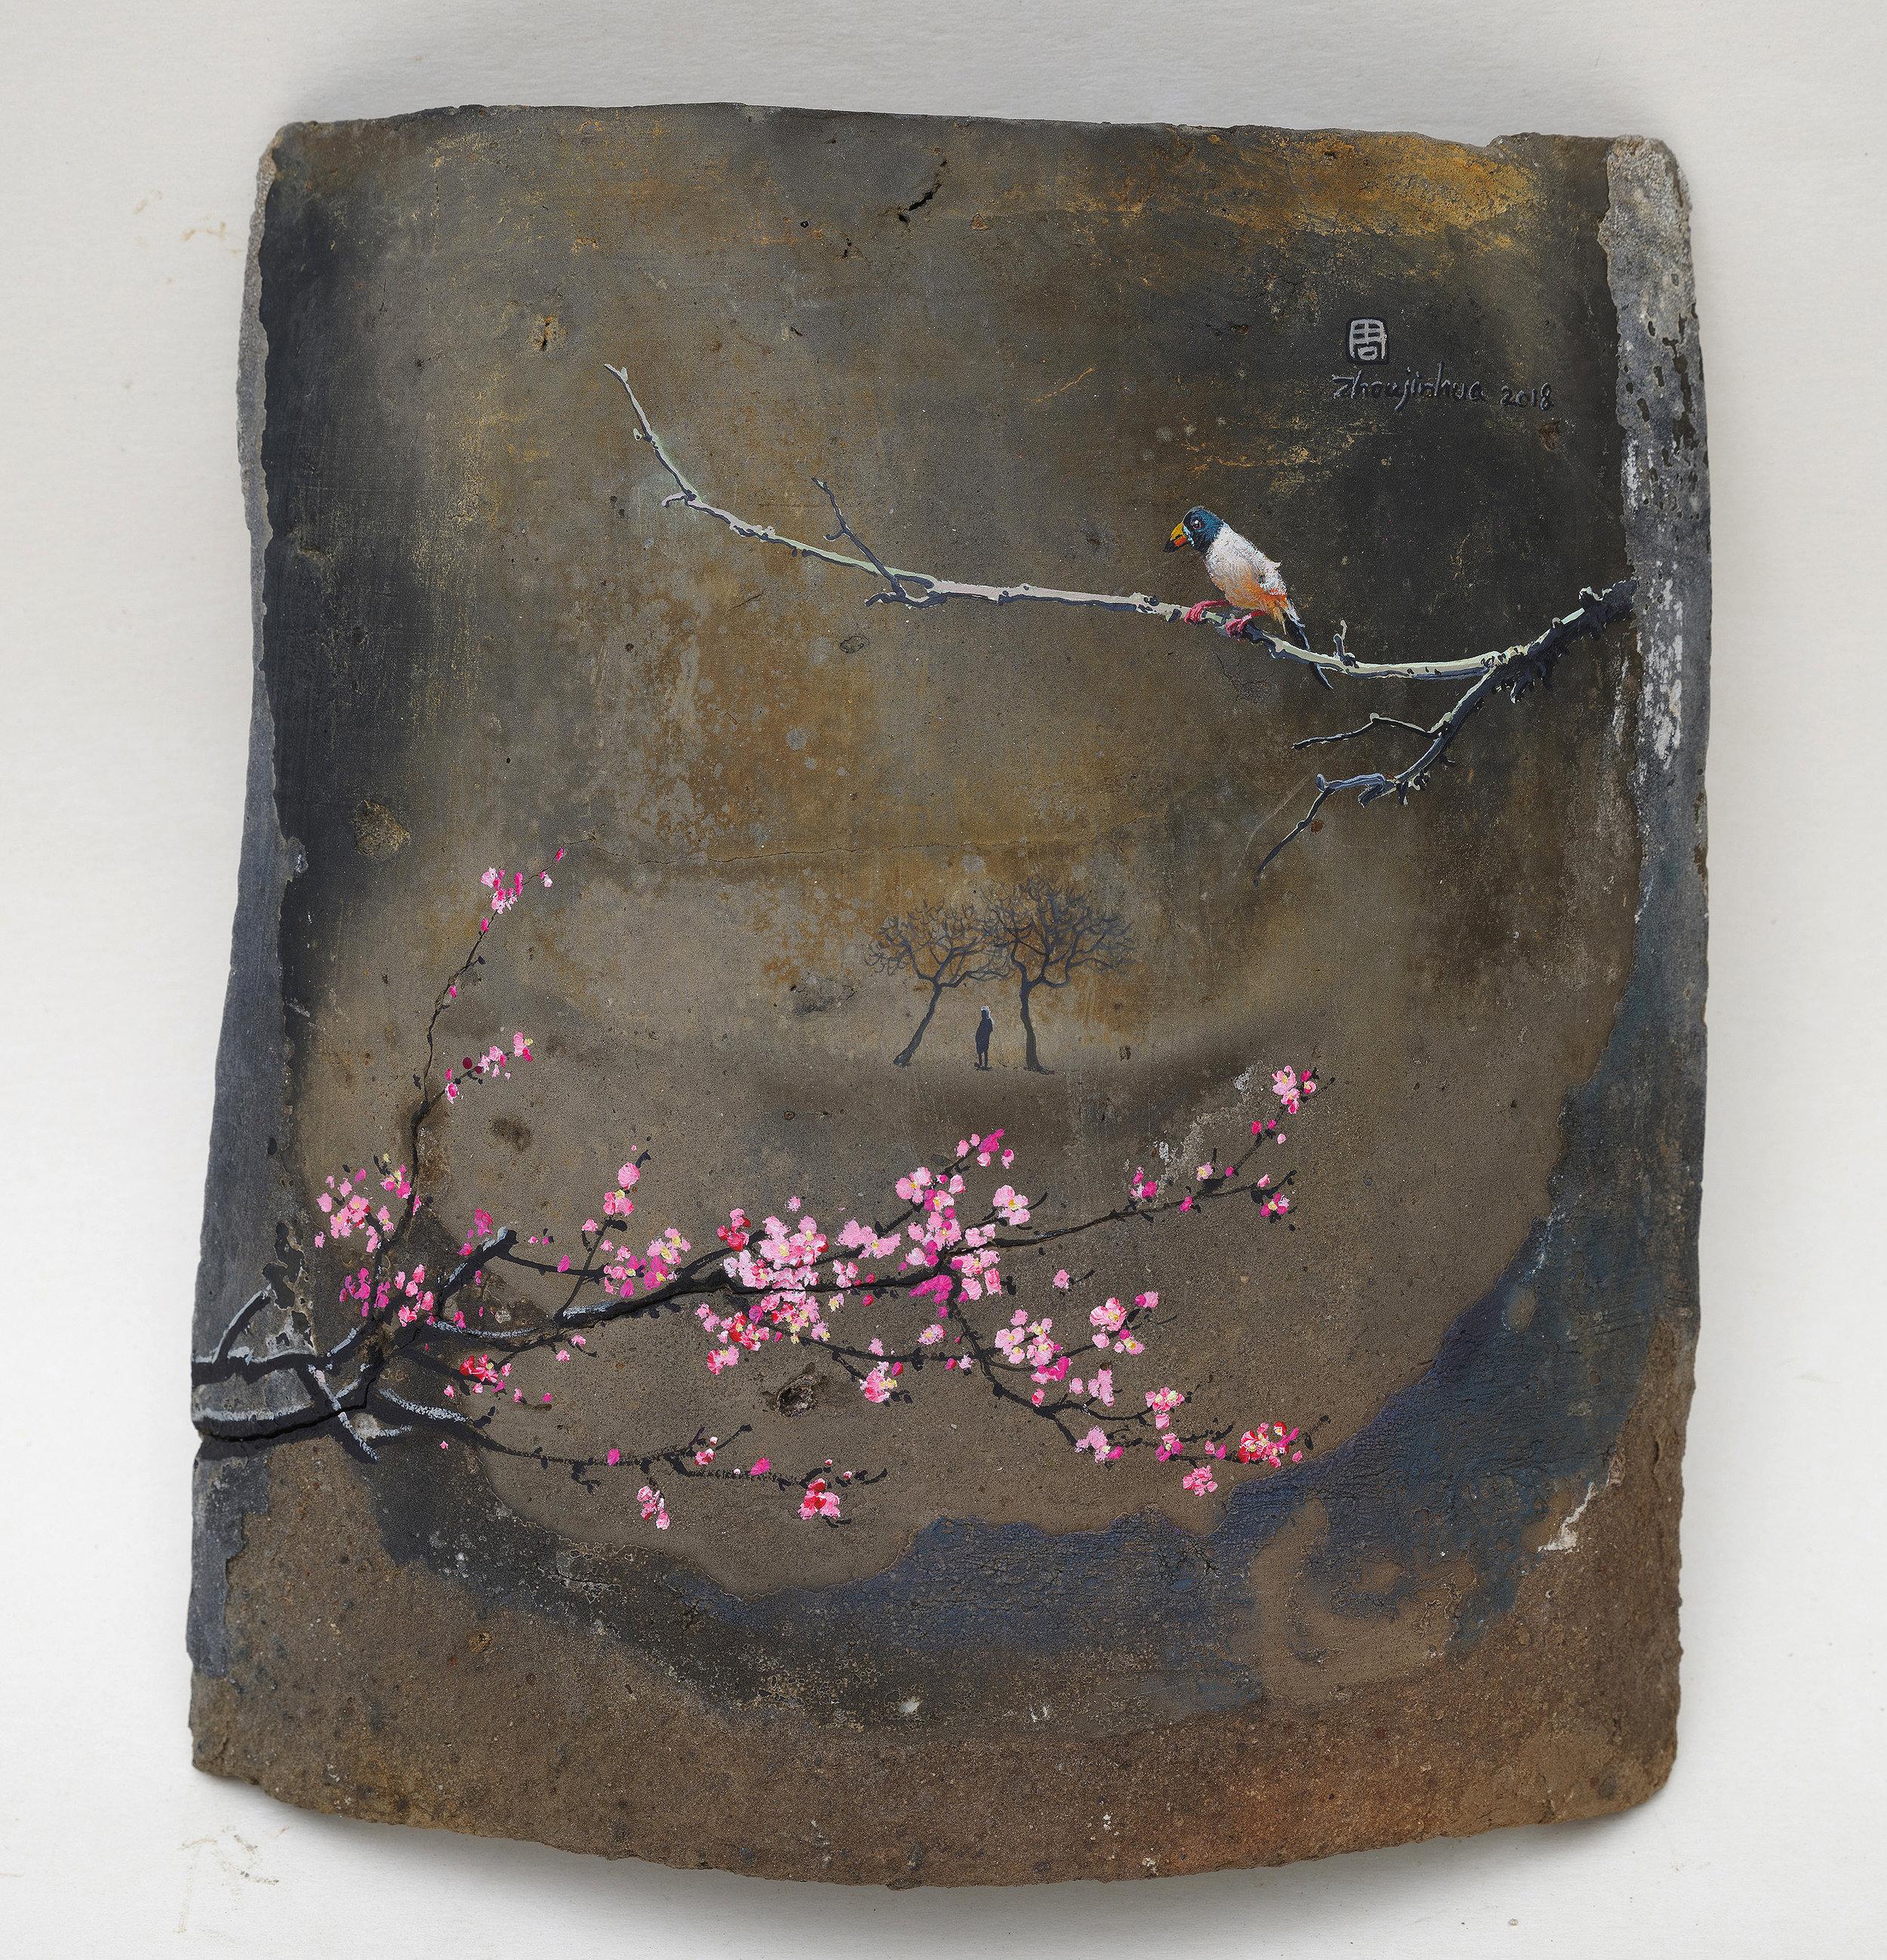 Zhou Jinhua 周金华, Remains of the Day 你我的痕迹 No.6, 2018, Acrylic on roof tile 瓦片、丙烯颜料, 21.5 x 19.5 cm